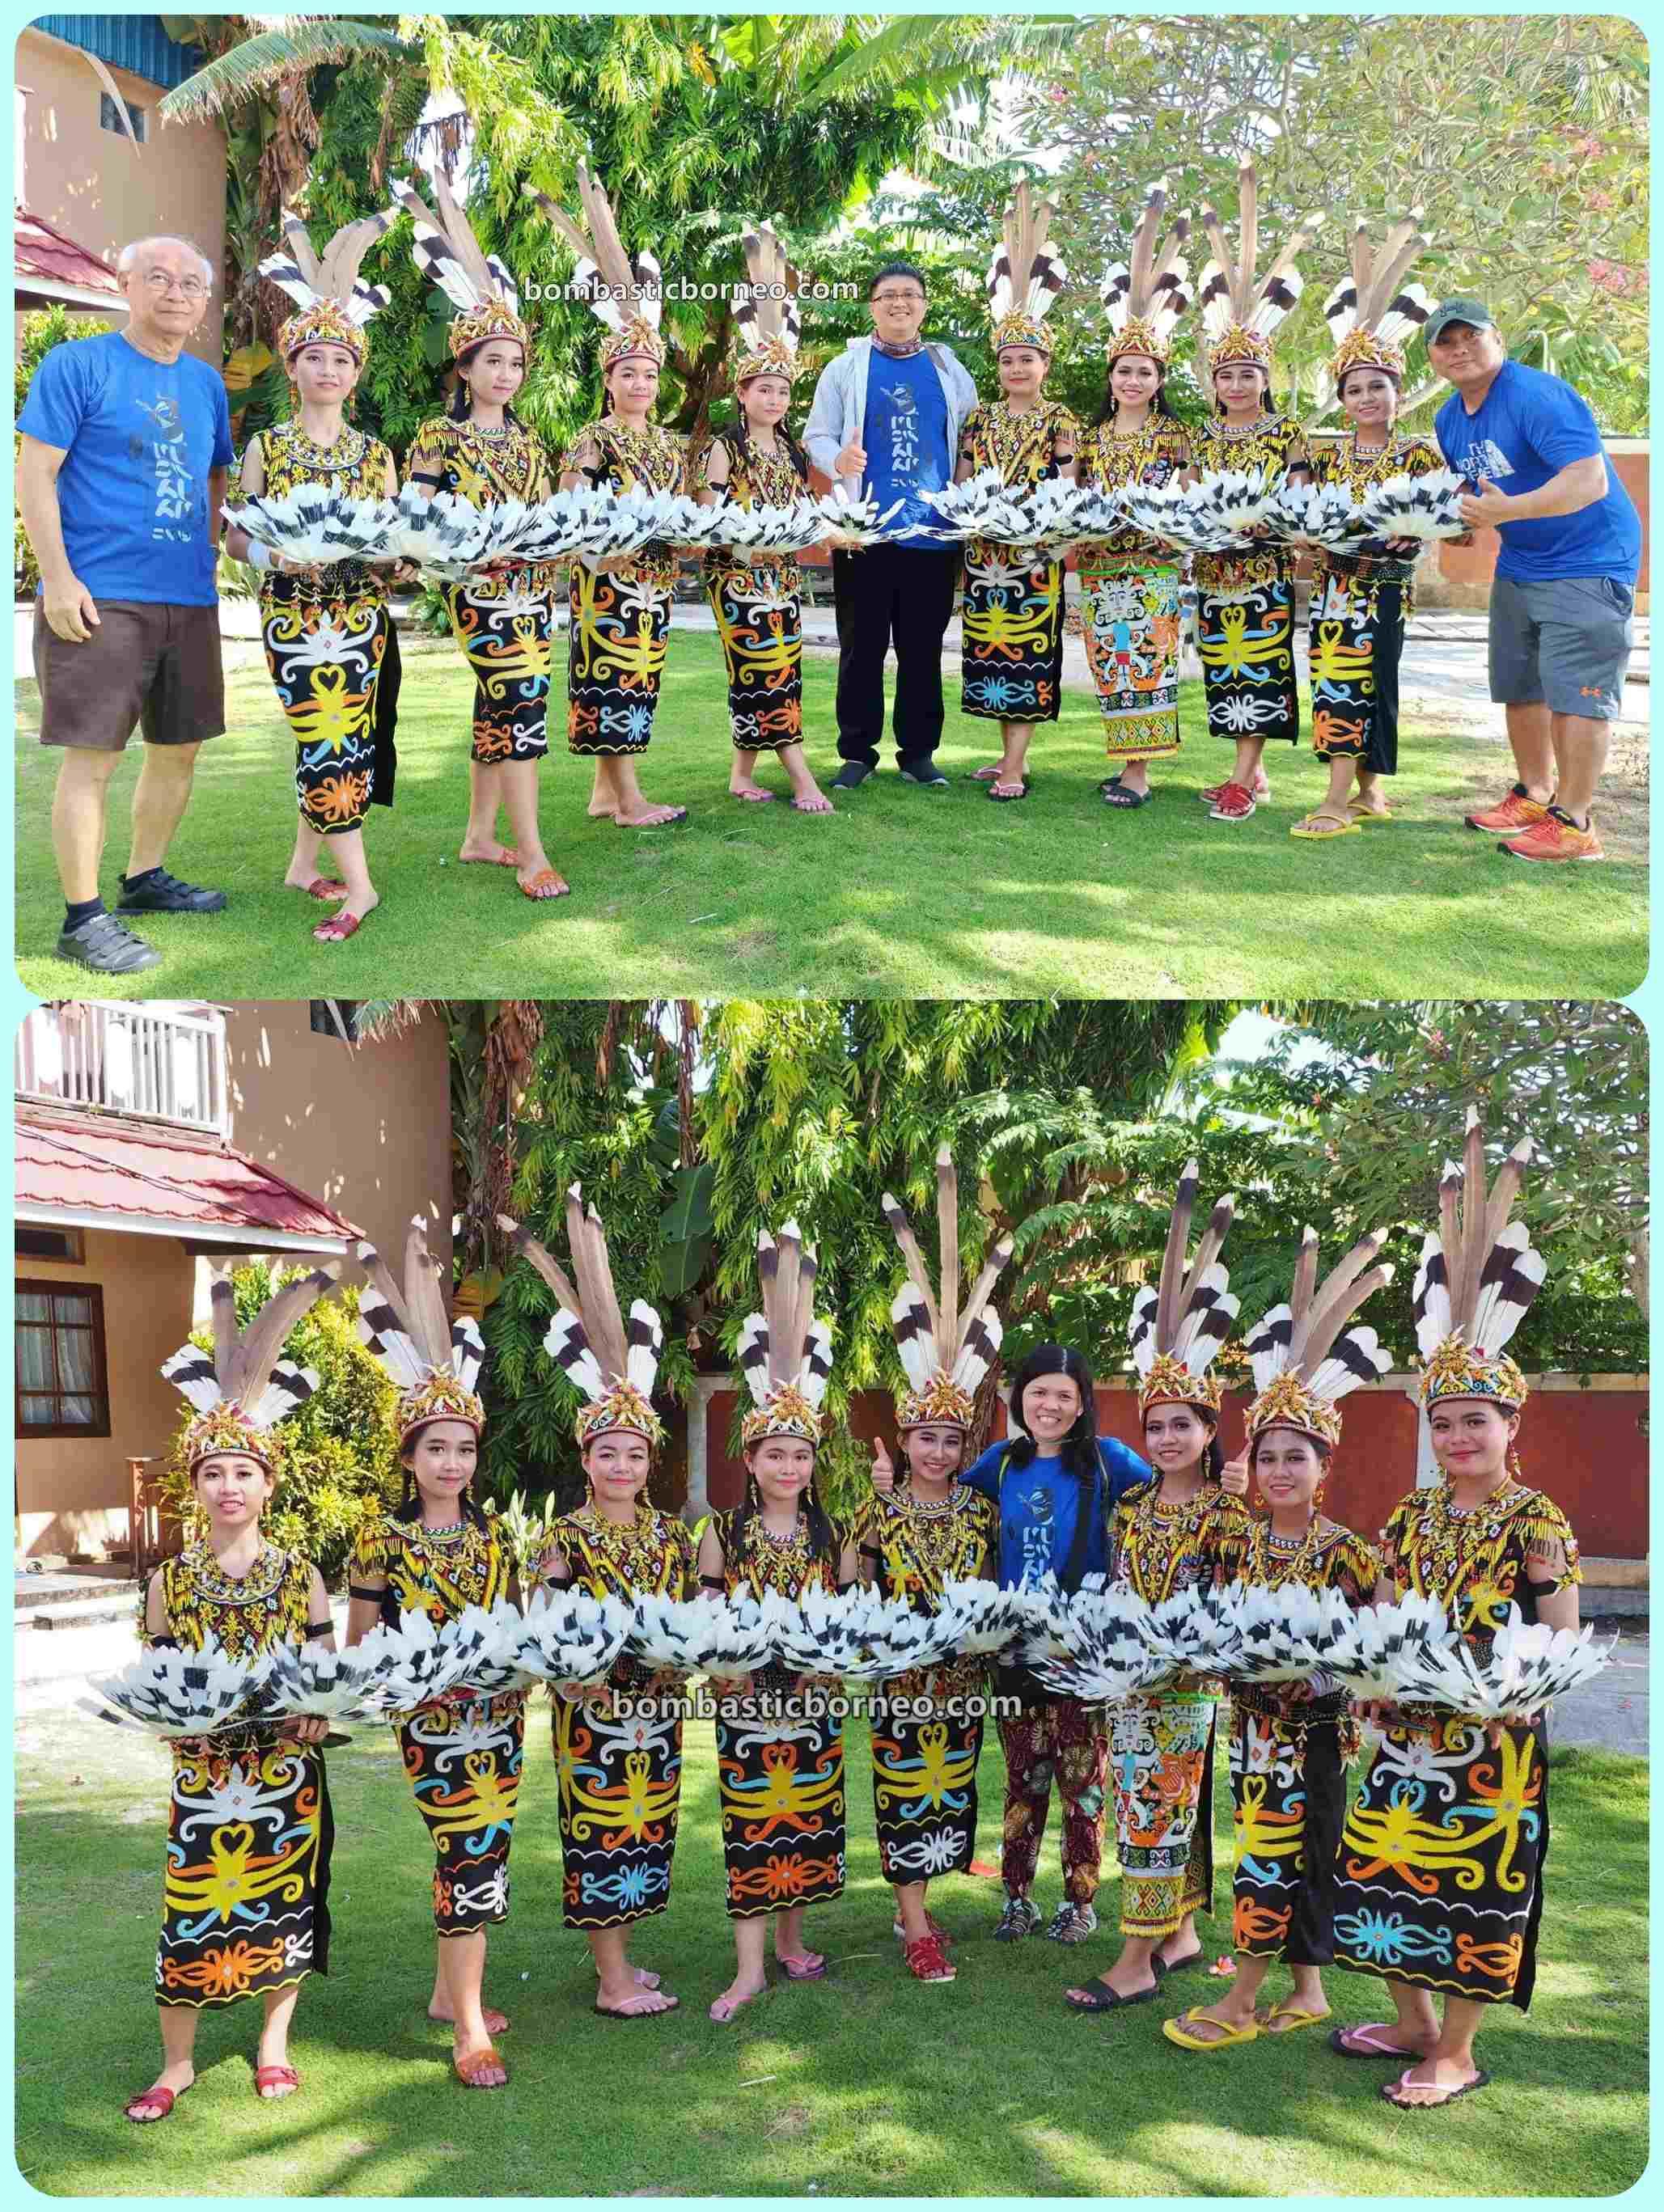 Pulau Derawan, backpackers, Destination, exploration, holiday, vacation, Berau, Kalimantan Timur, Objek wisata, Pariwisata, Tourism, travel guide, Trans Borneo, 跨境婆罗洲游踪, 印尼东加里曼丹